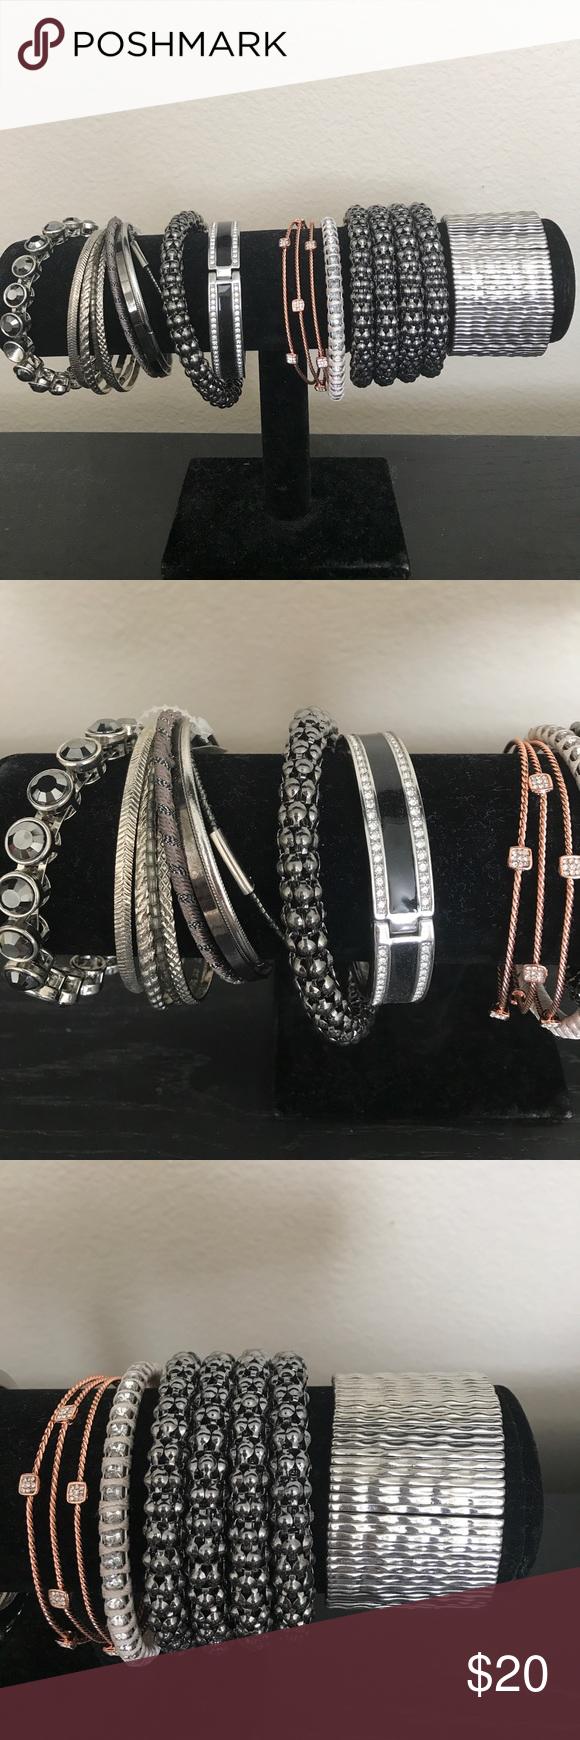 (8) LOFT bracelets MOVING SALE (8) never worn LOFT Bracelets- One still has a tag on it. Moving sale. Everything needs to go. 😃 LOFT Accessories